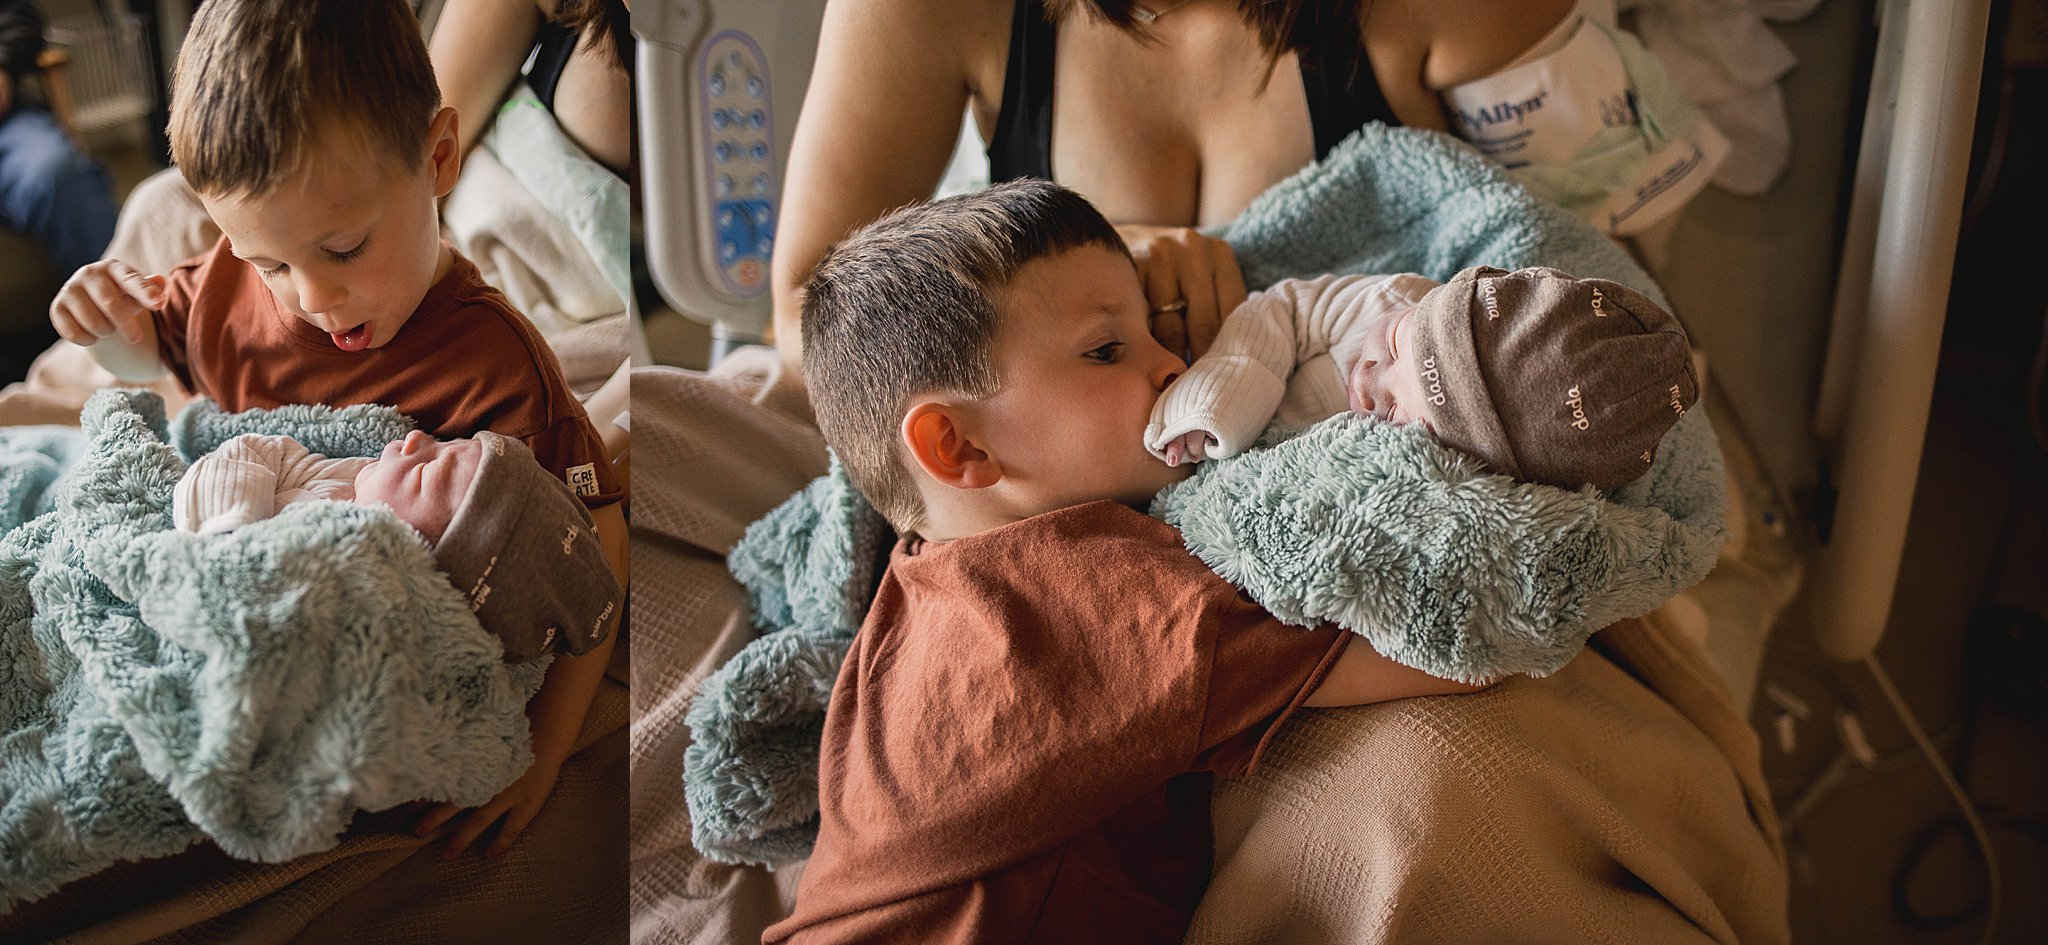 2019-03-16-hospital-baby-birth-photo-osage-beach-missouri-lake-8.jpg